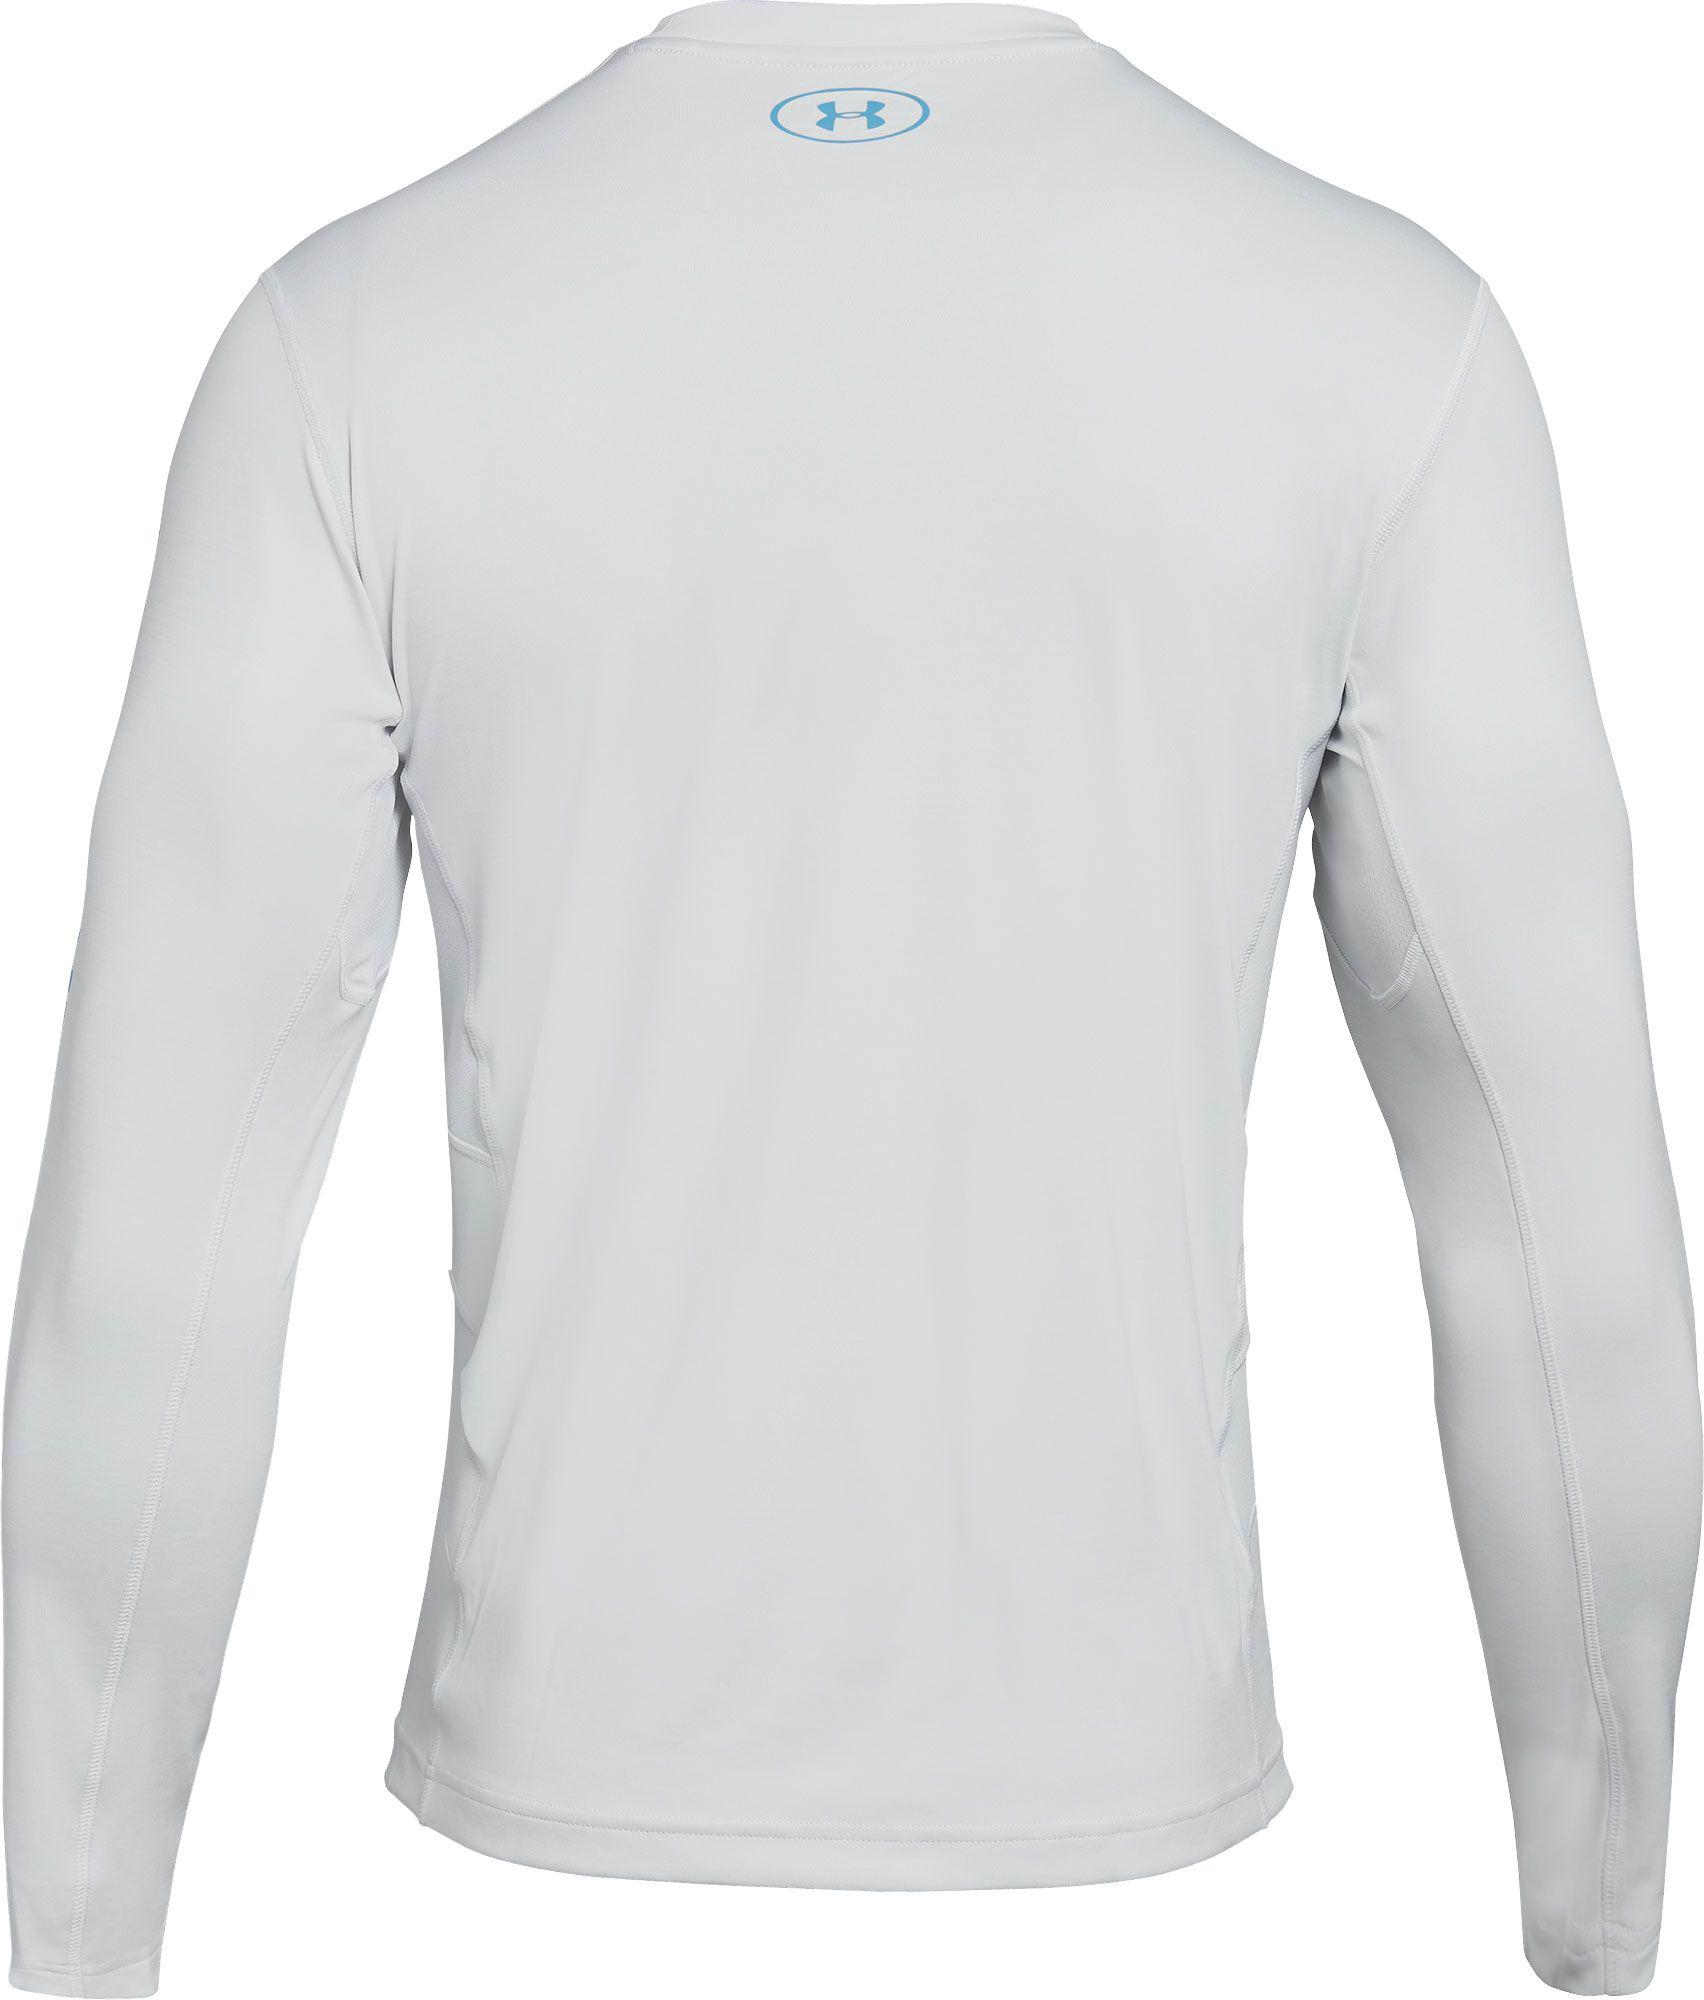 6d2912e63bf7 White Under Armour Fishing Shirt | Azərbaycan Dillər Universiteti